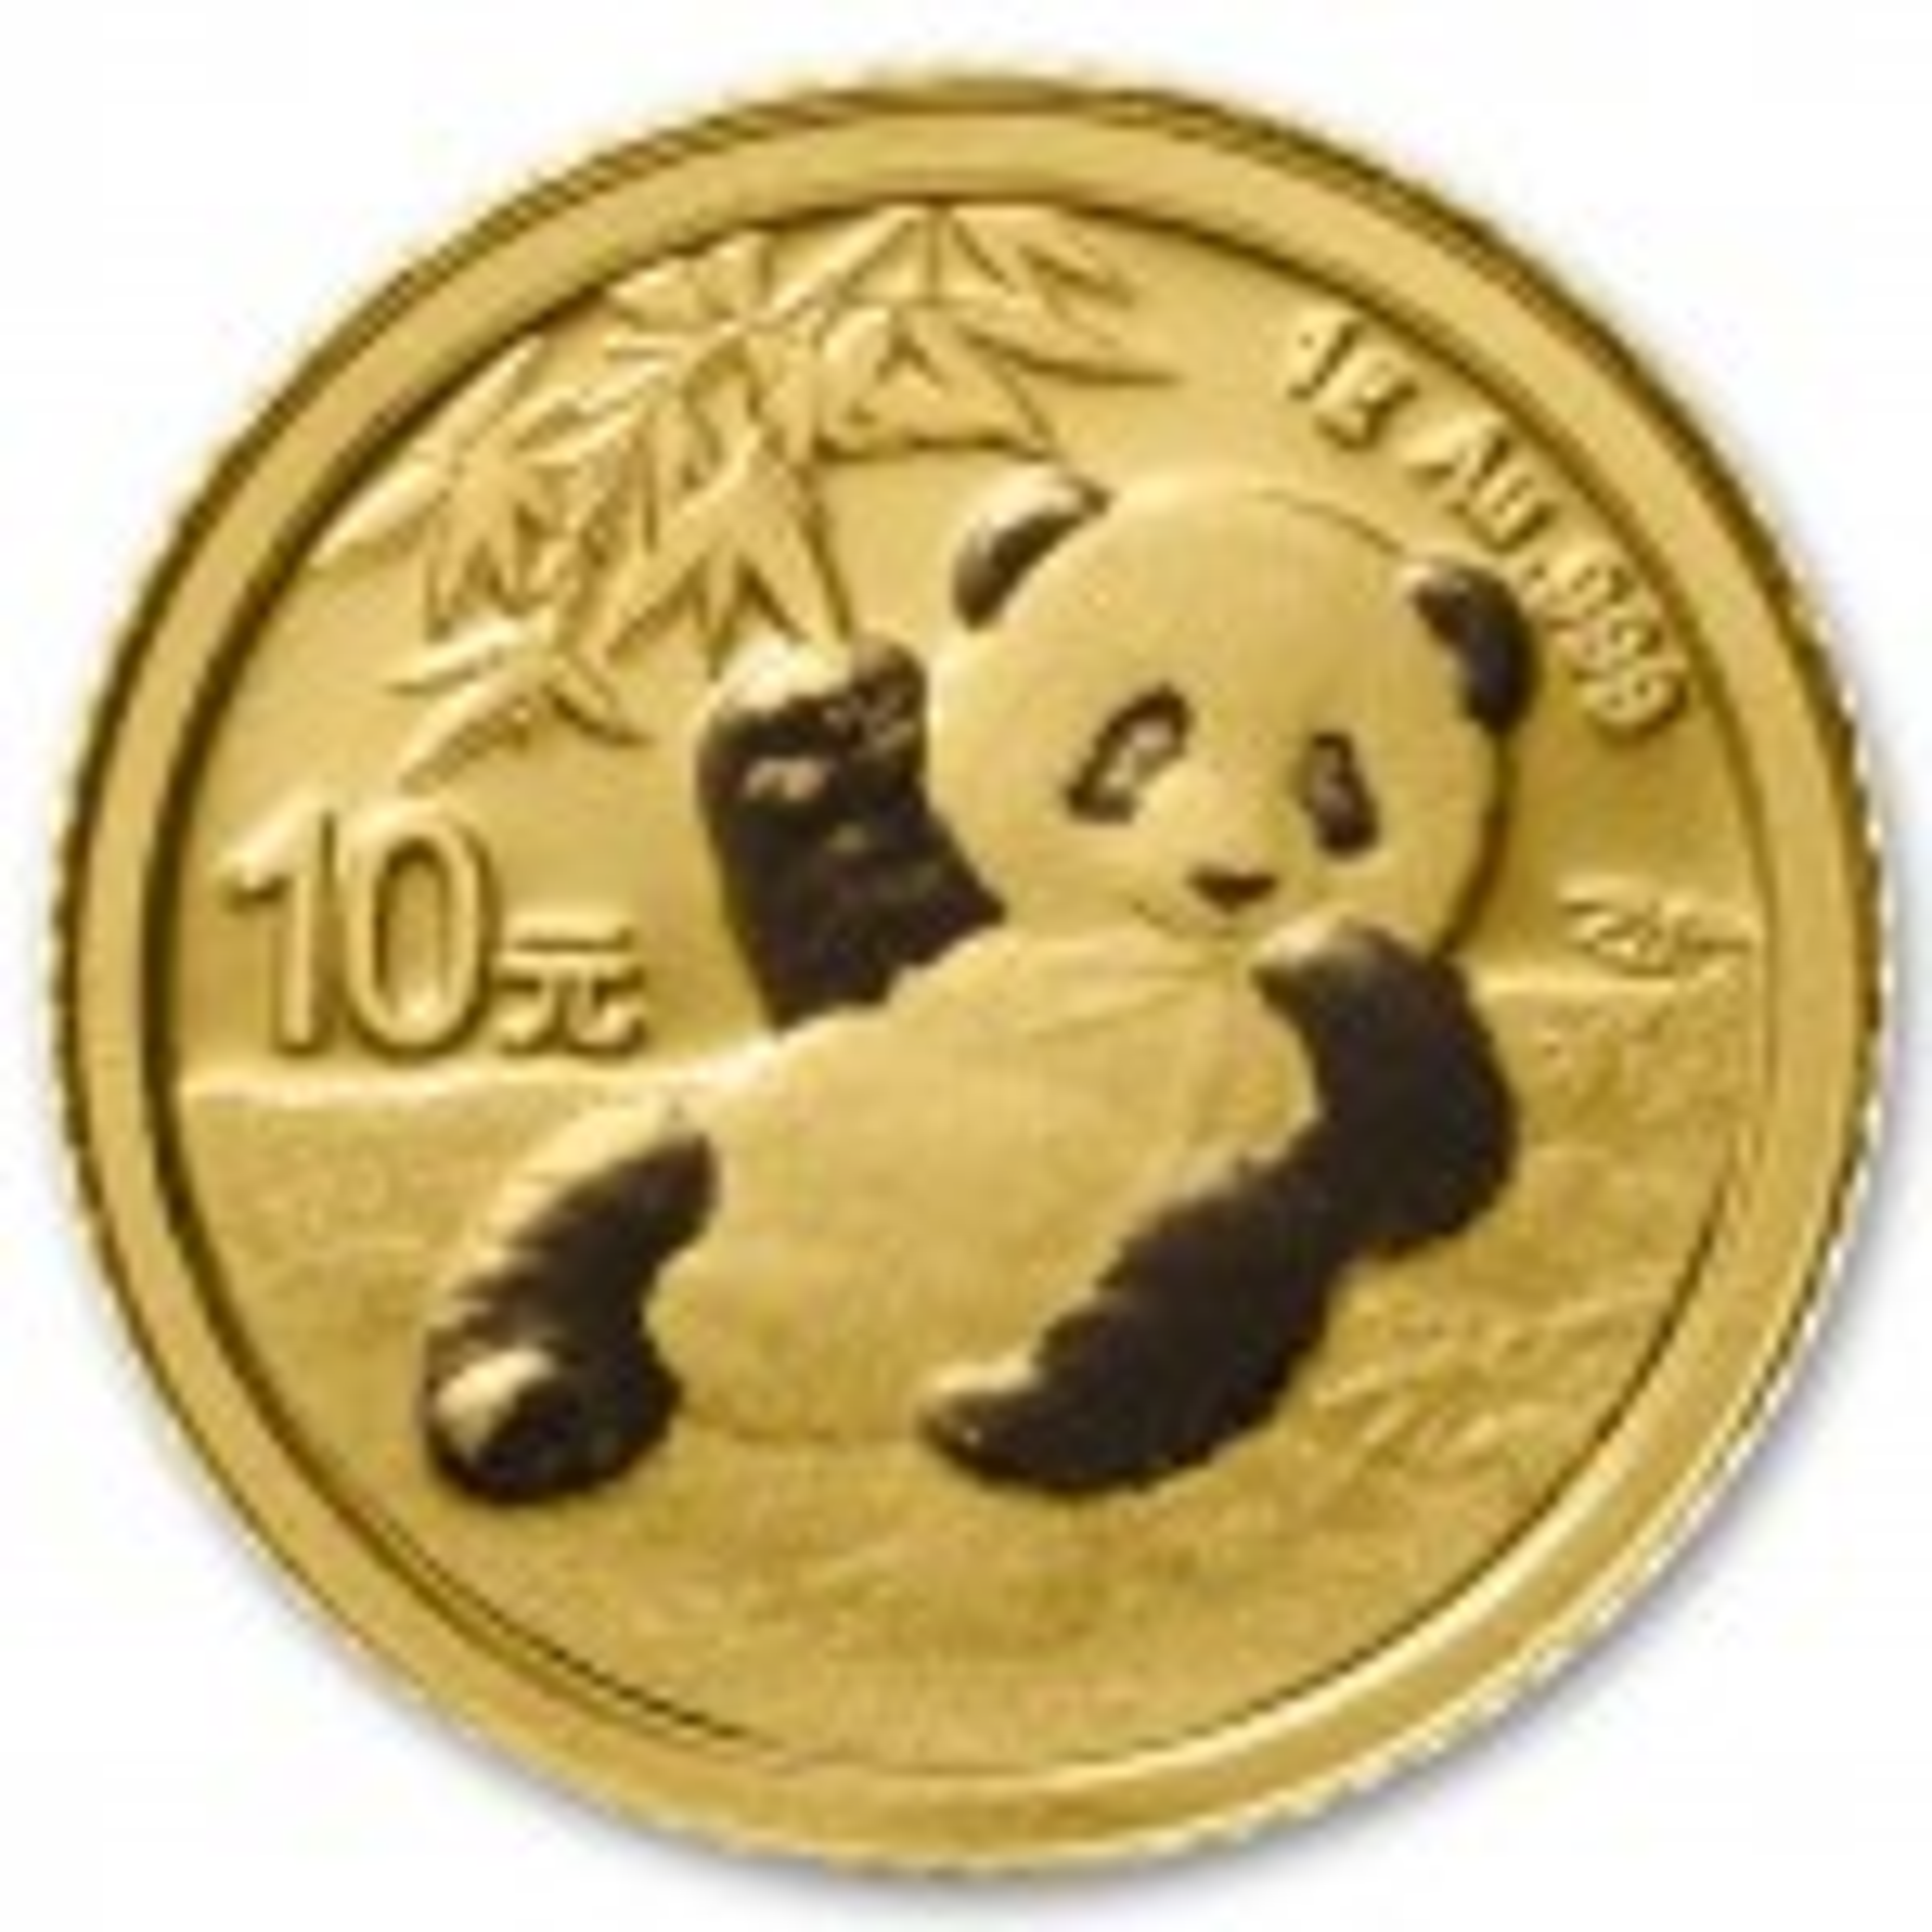 1 Gram gold coin Panda 2020